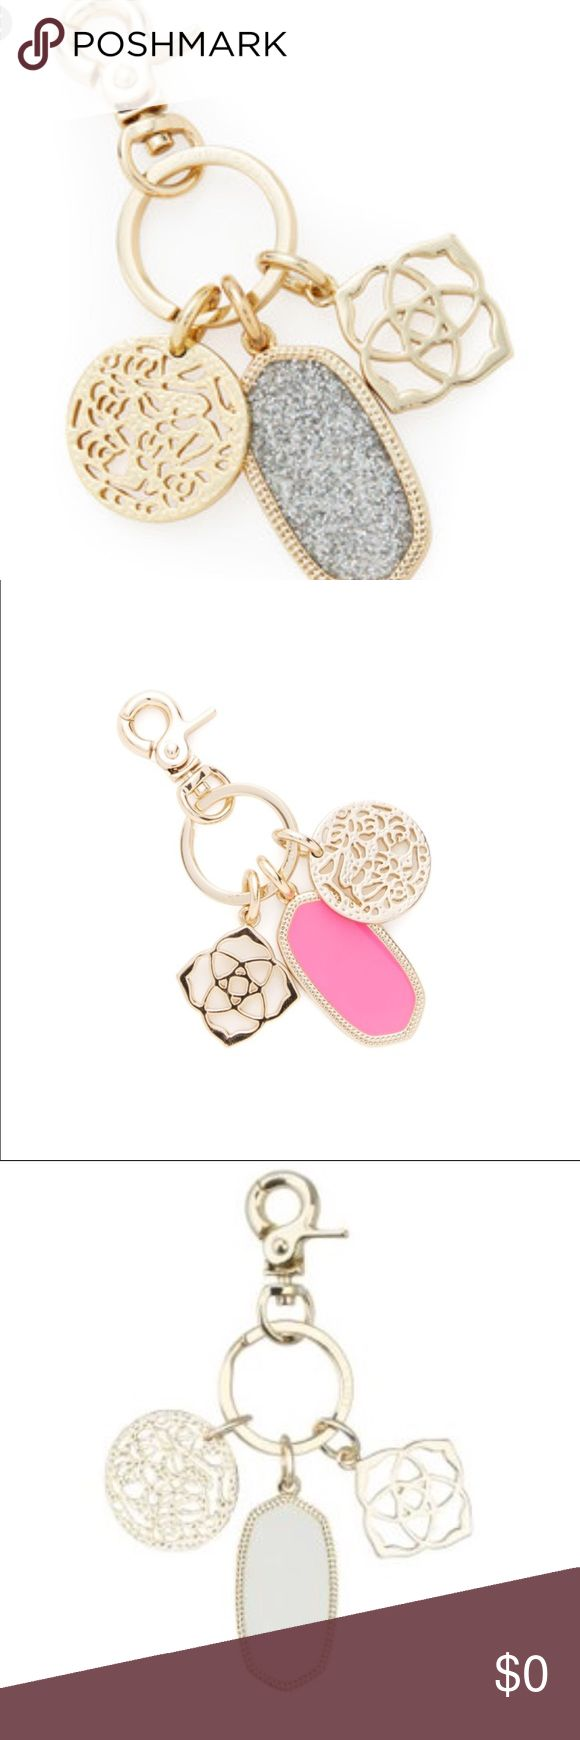 ISO!!!!!! Looking for Kendra Scott Keychain Kendra Scott Shirley Keychain Kendra Scott Jewelry